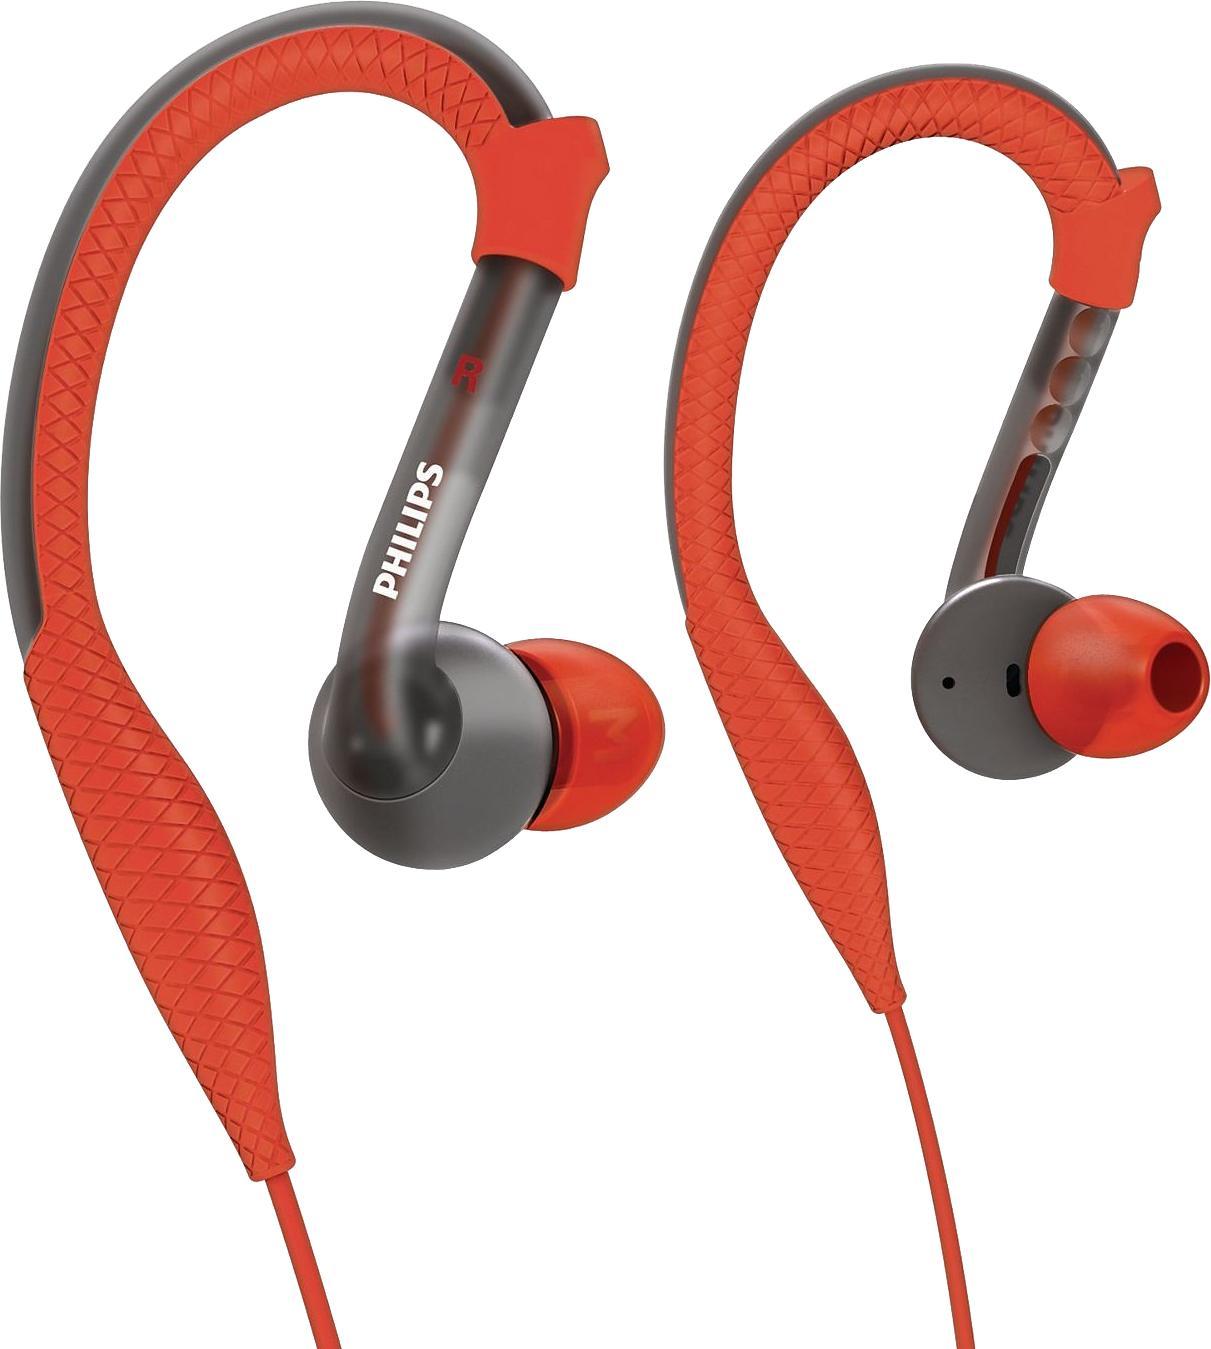 Philips ActionFit Earhook